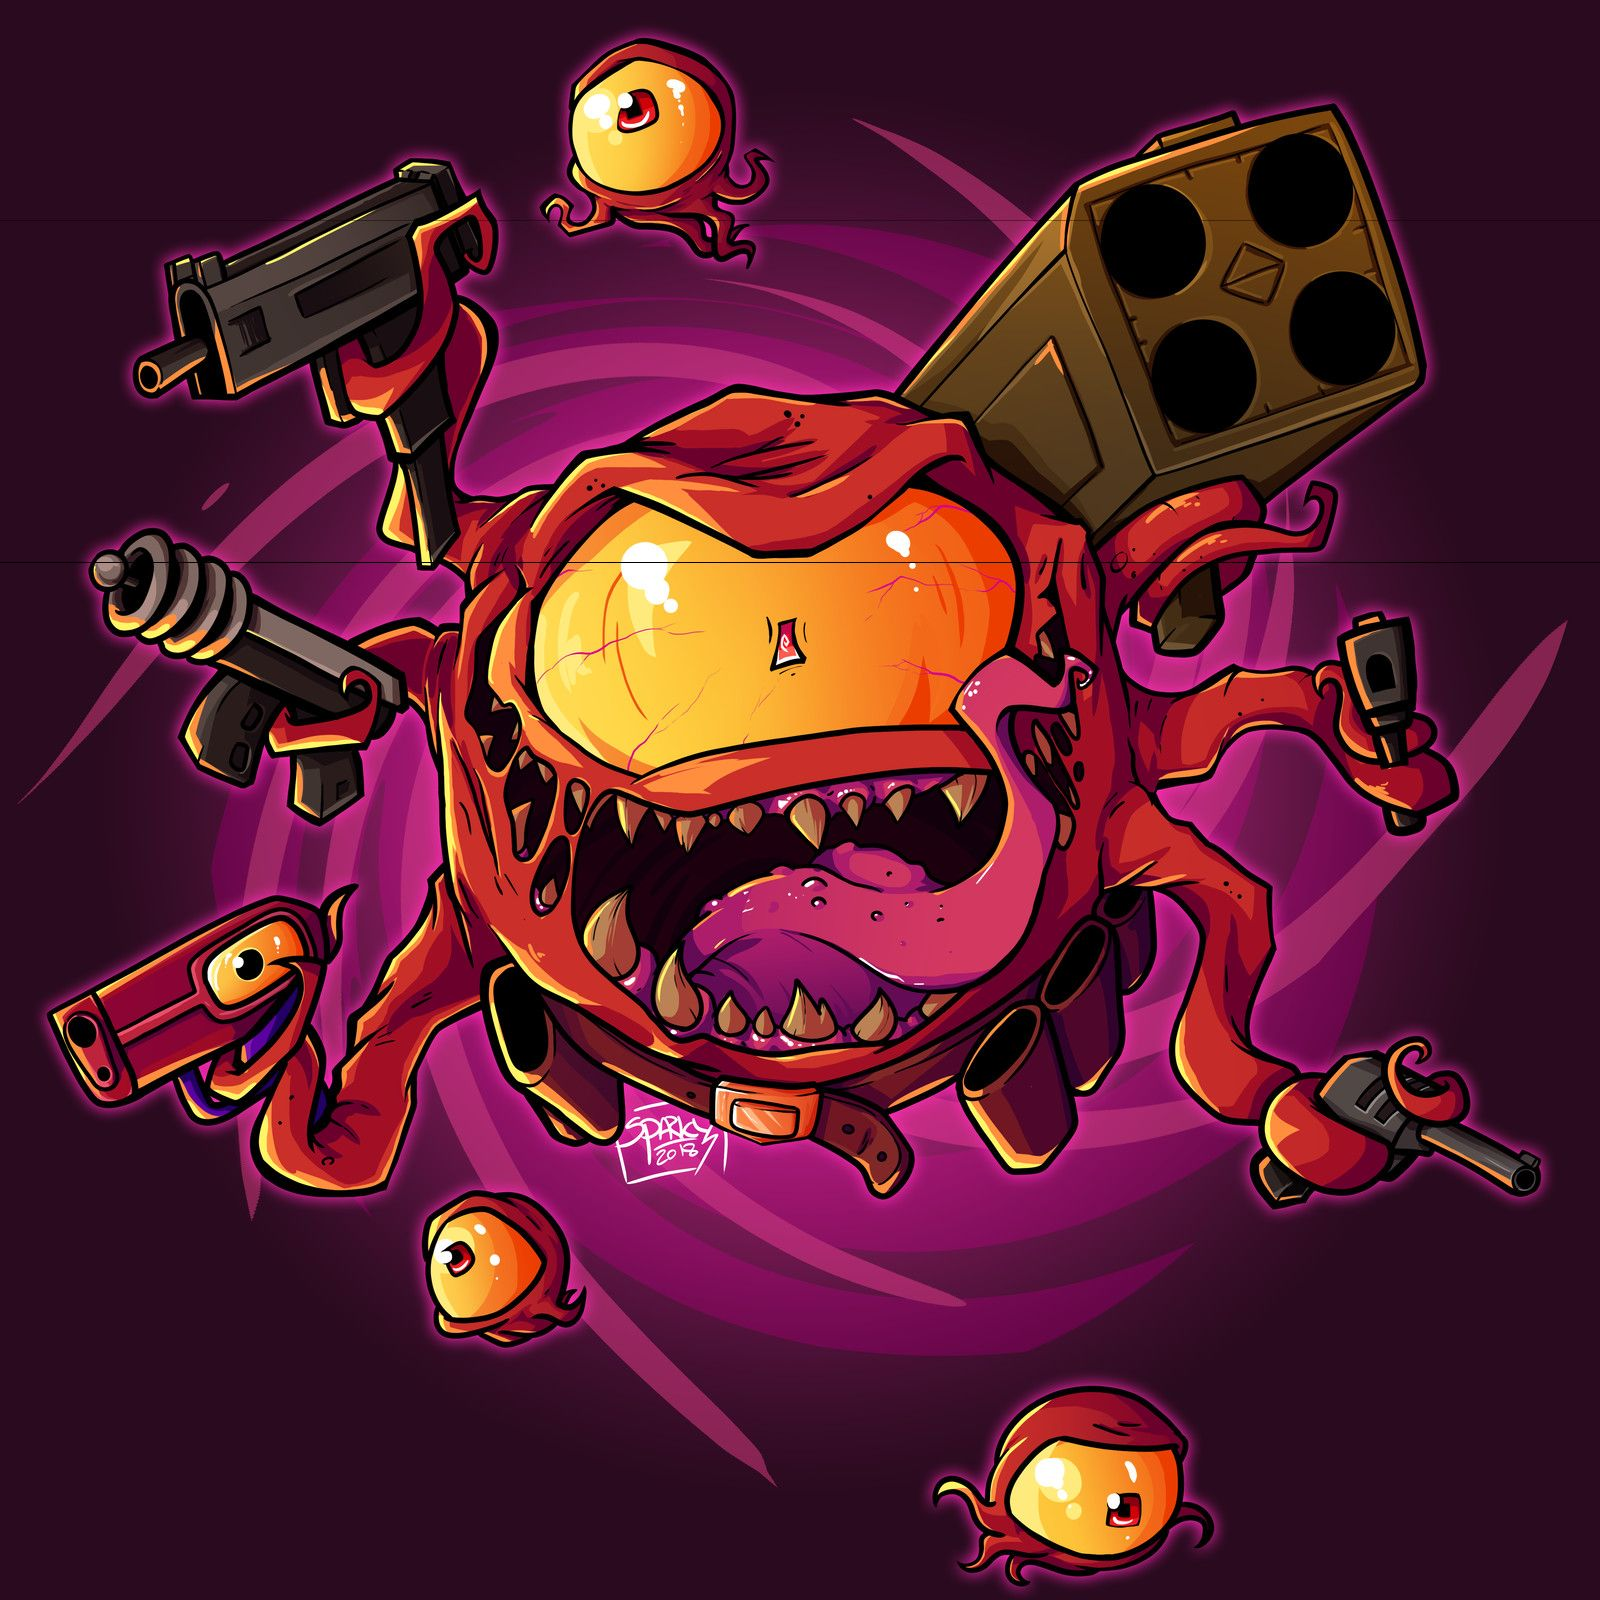 Enter The Gungeon Beholster Arky Fitzwater On Artstation At Https Www Artstation Com Artwork O8aw6 Game Art Geek Art Doodle Art